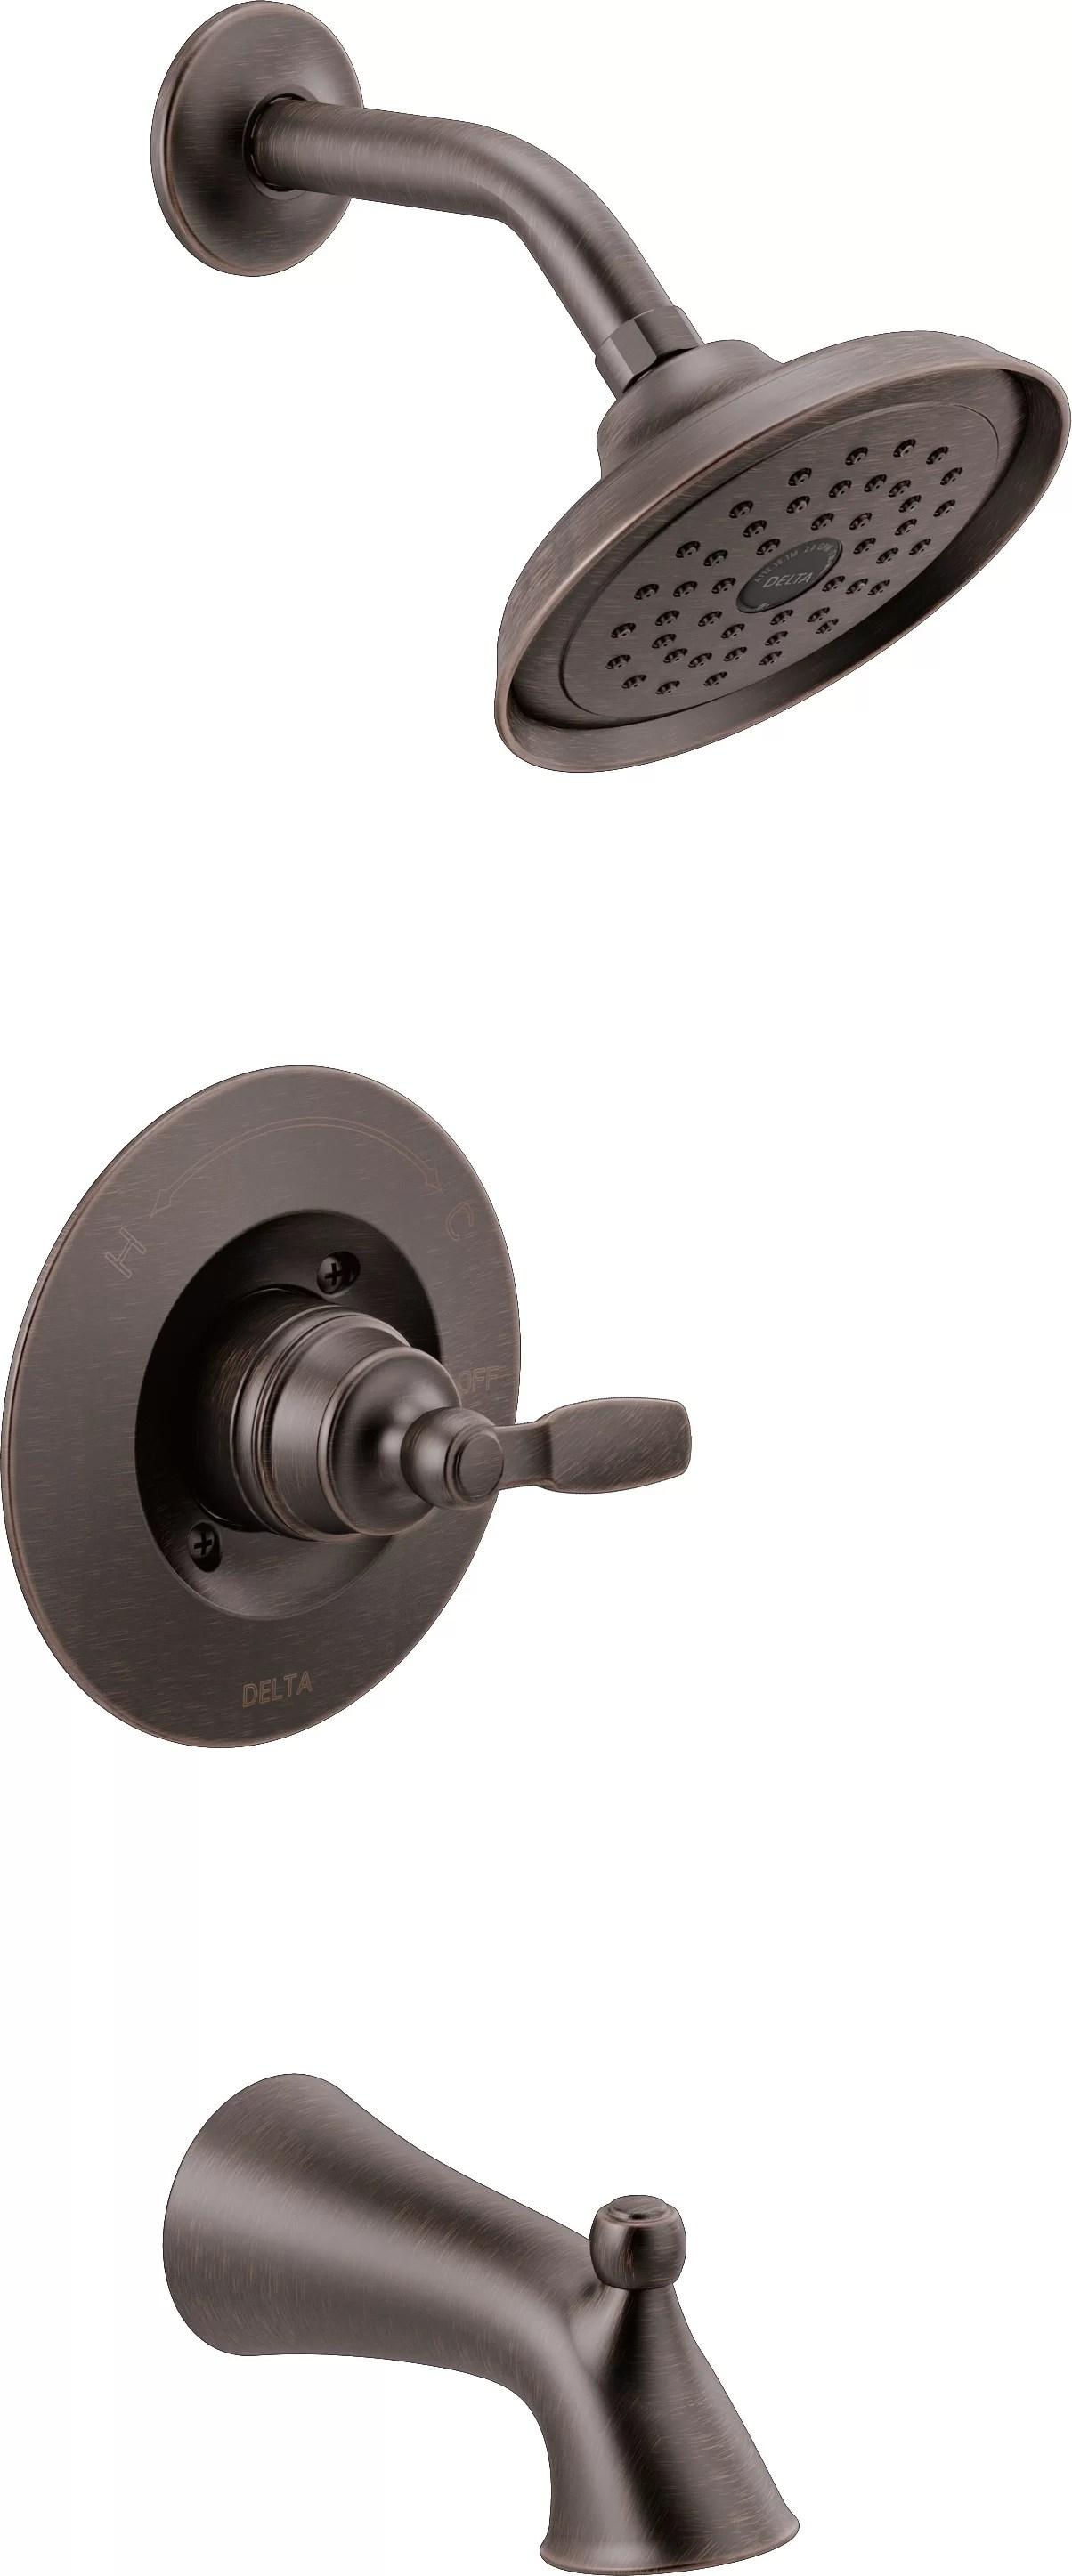 https www wayfair com home improvement pdp delta woodhurst pressure balanced tub and shower faucet with monitor cbkb1908 html